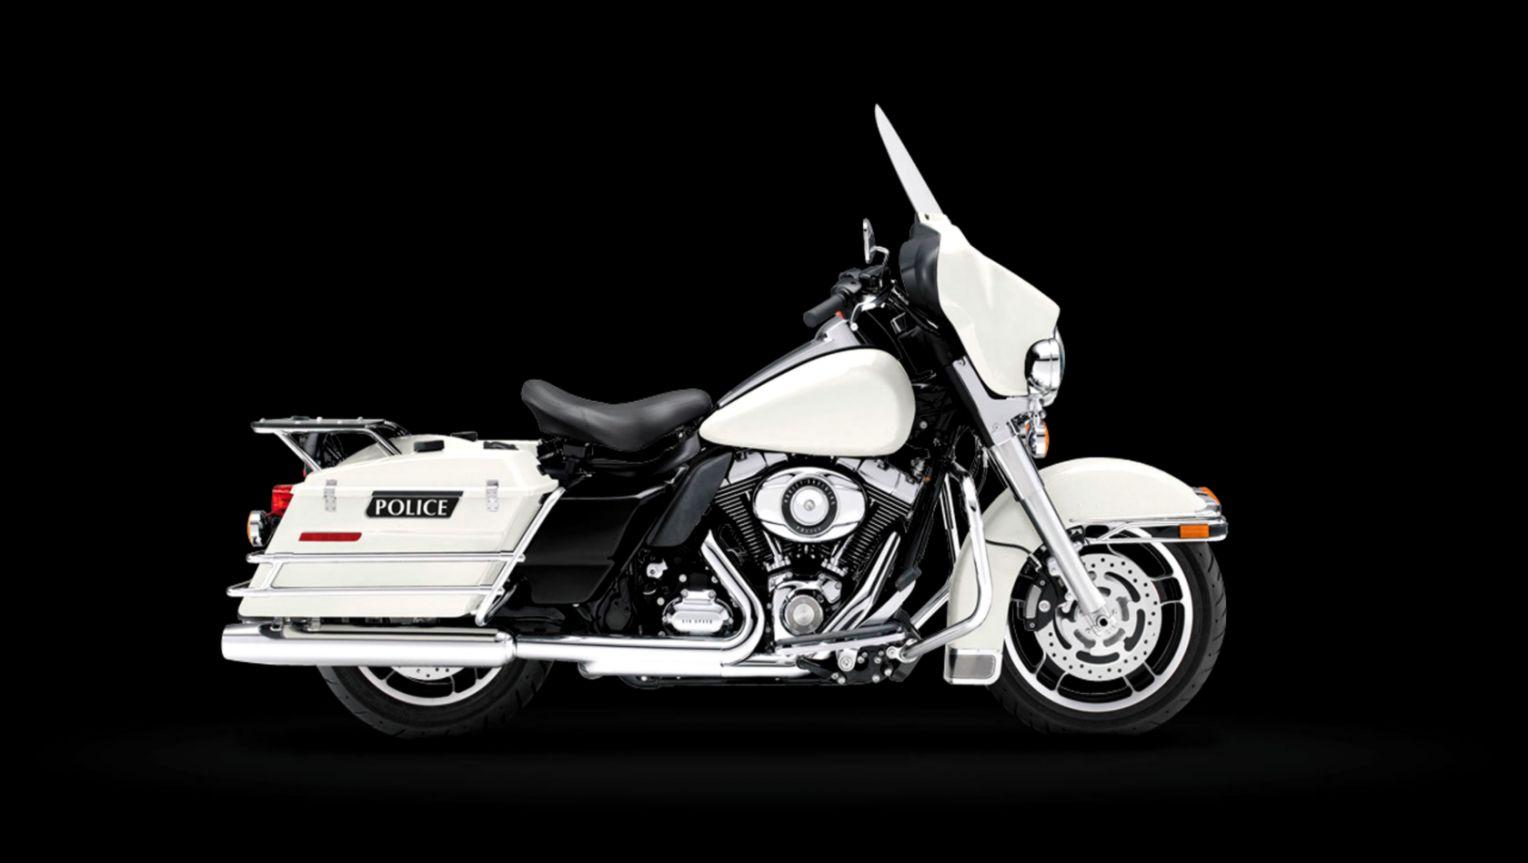 View Original Size 2013 Harley Davidson FLHTP Electra